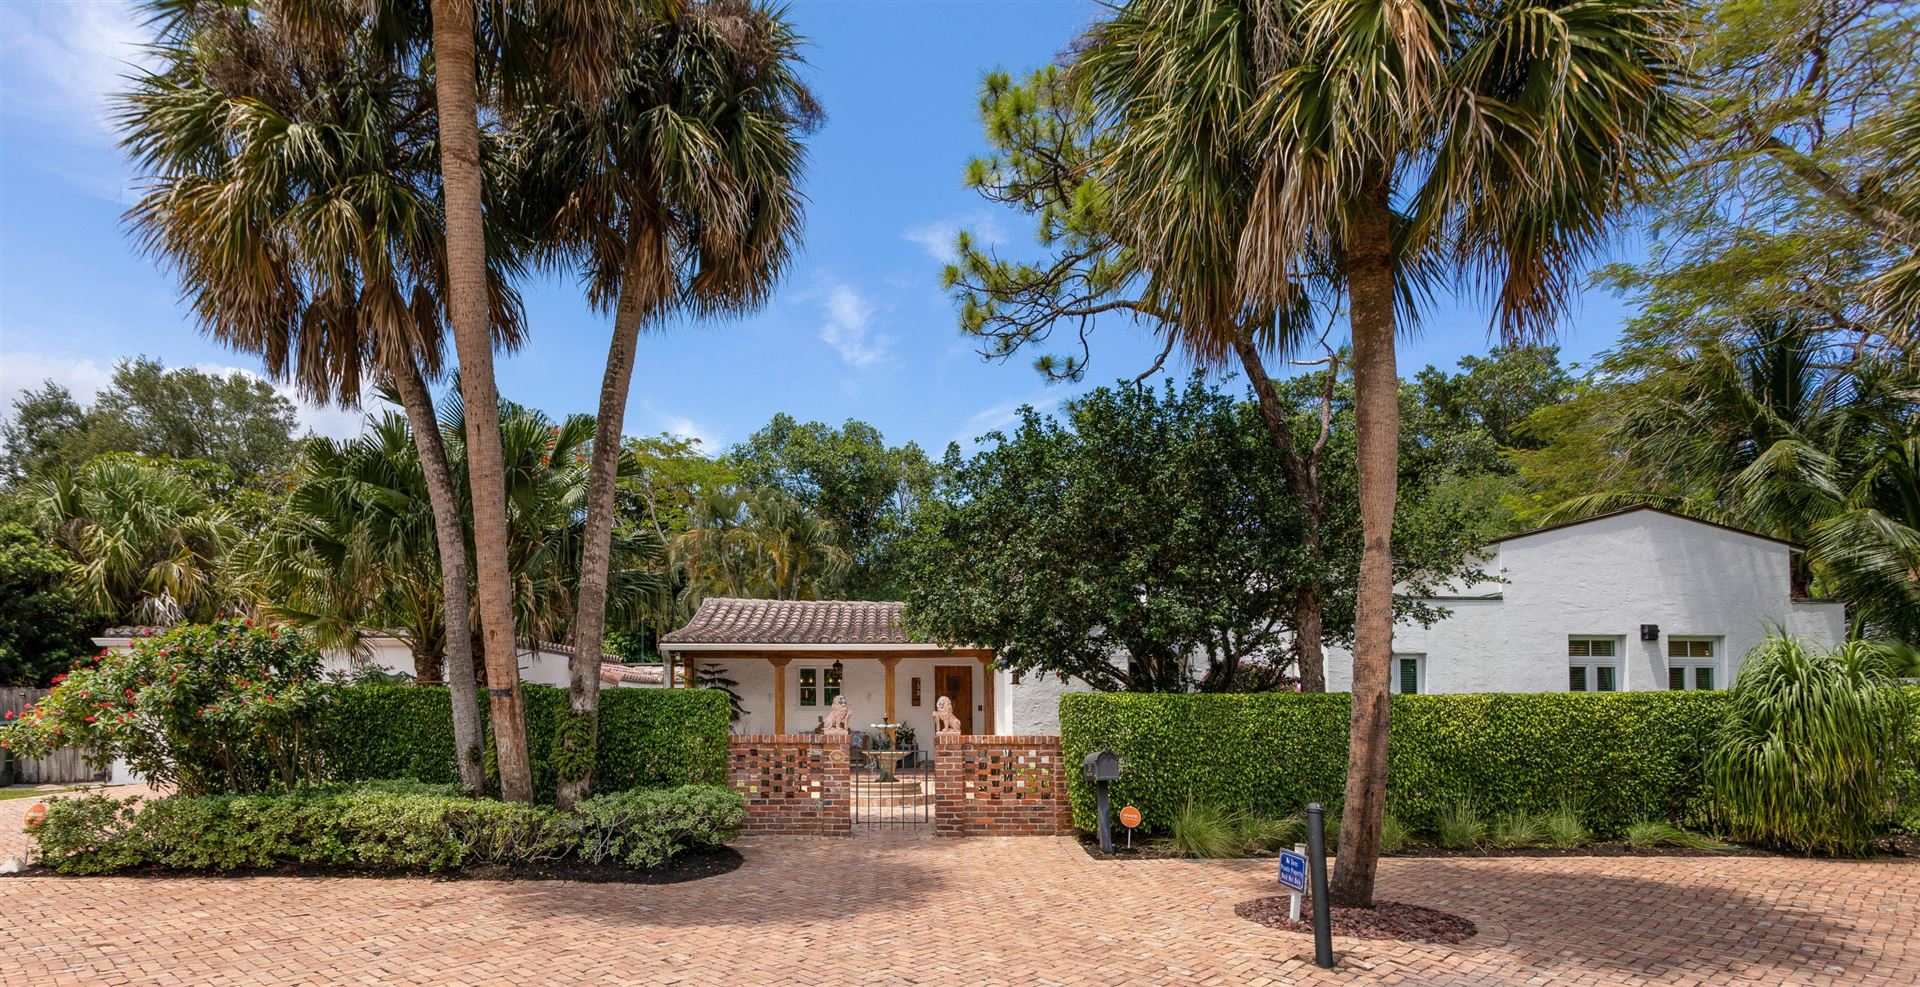 Photo of 755 Azalea Street, Boca Raton, FL 33486 (MLS # RX-10714452)